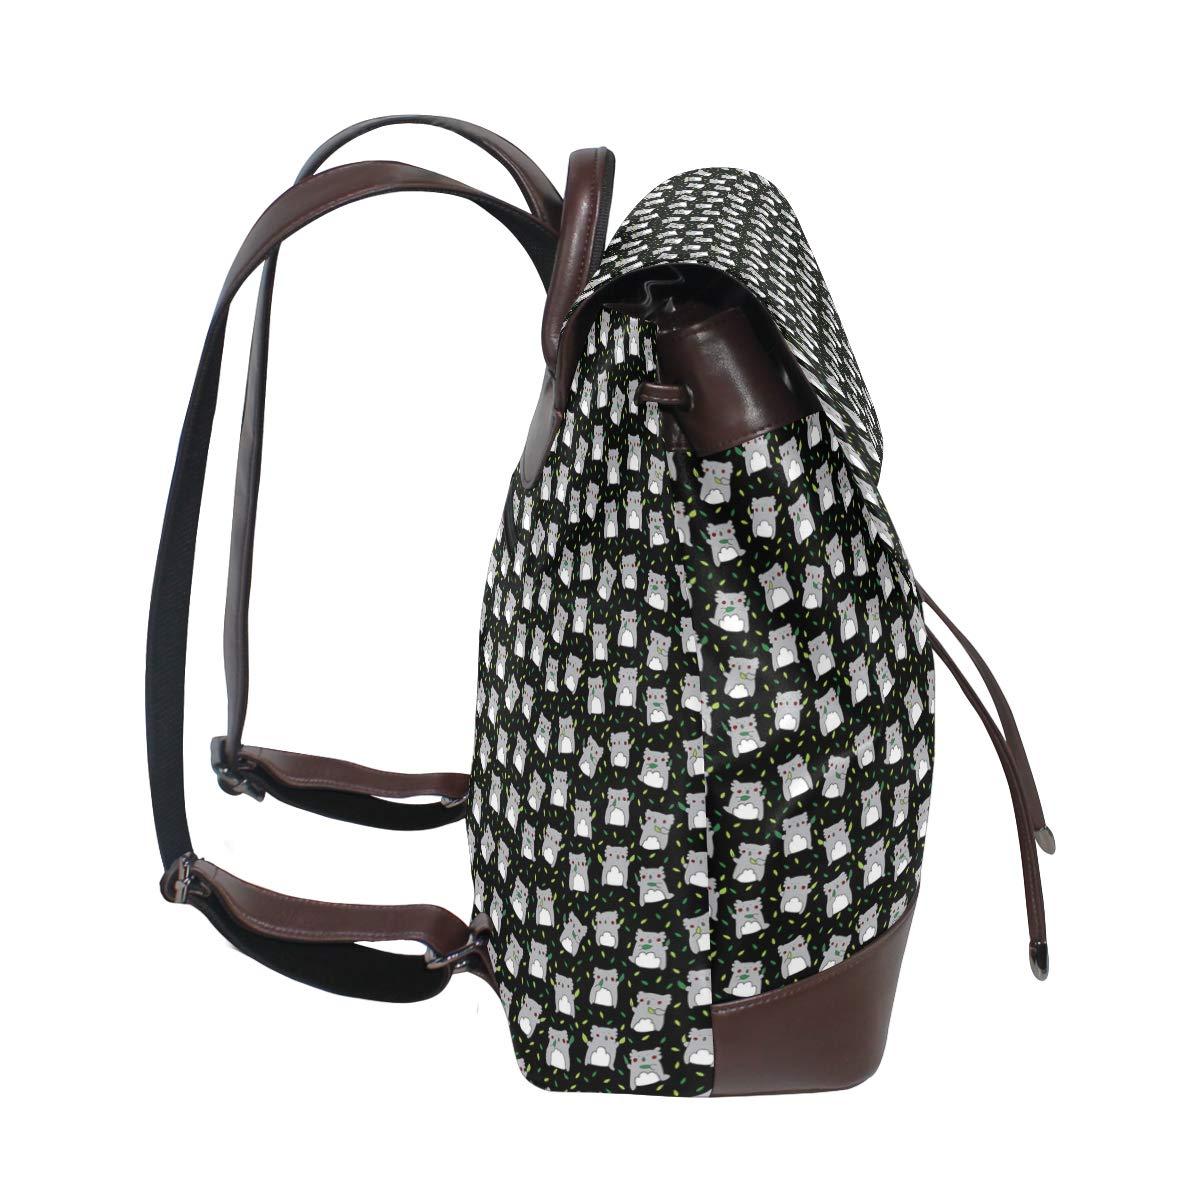 Leather Cute Koala Black Backpack Daypack Elegant Ladies Travel Bag Women Men